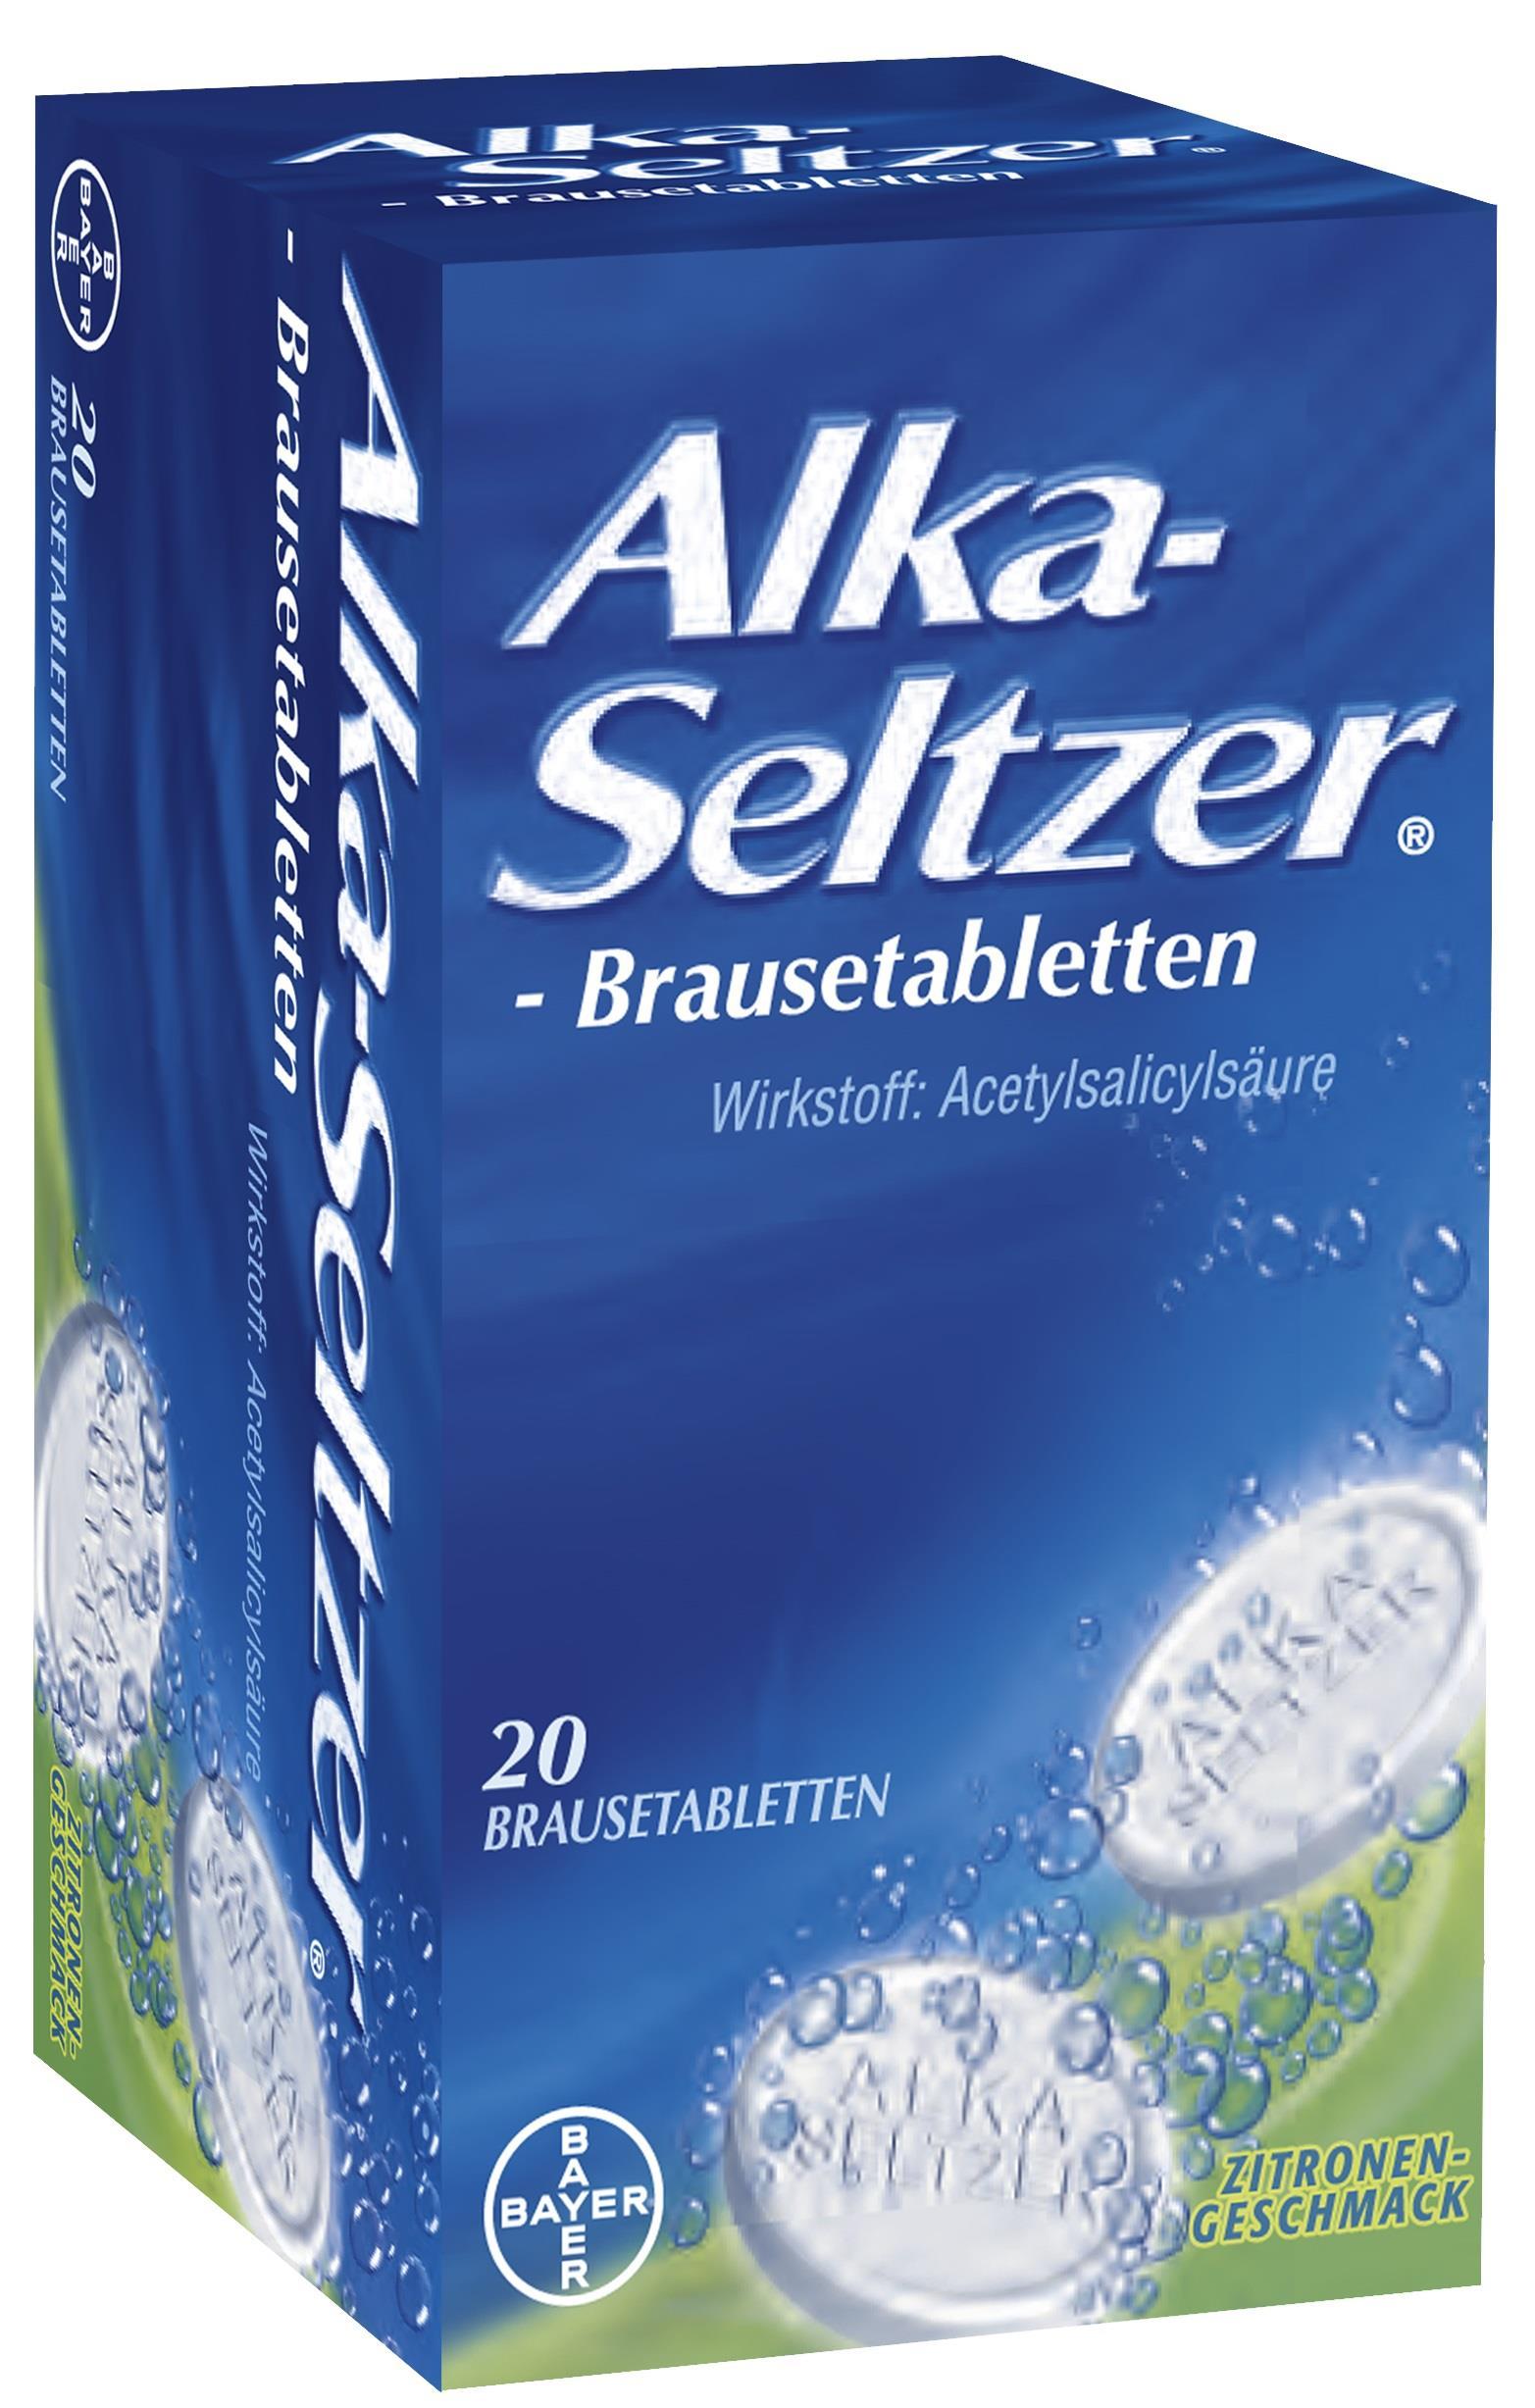 Alka-Seltzer - Brausetabletten